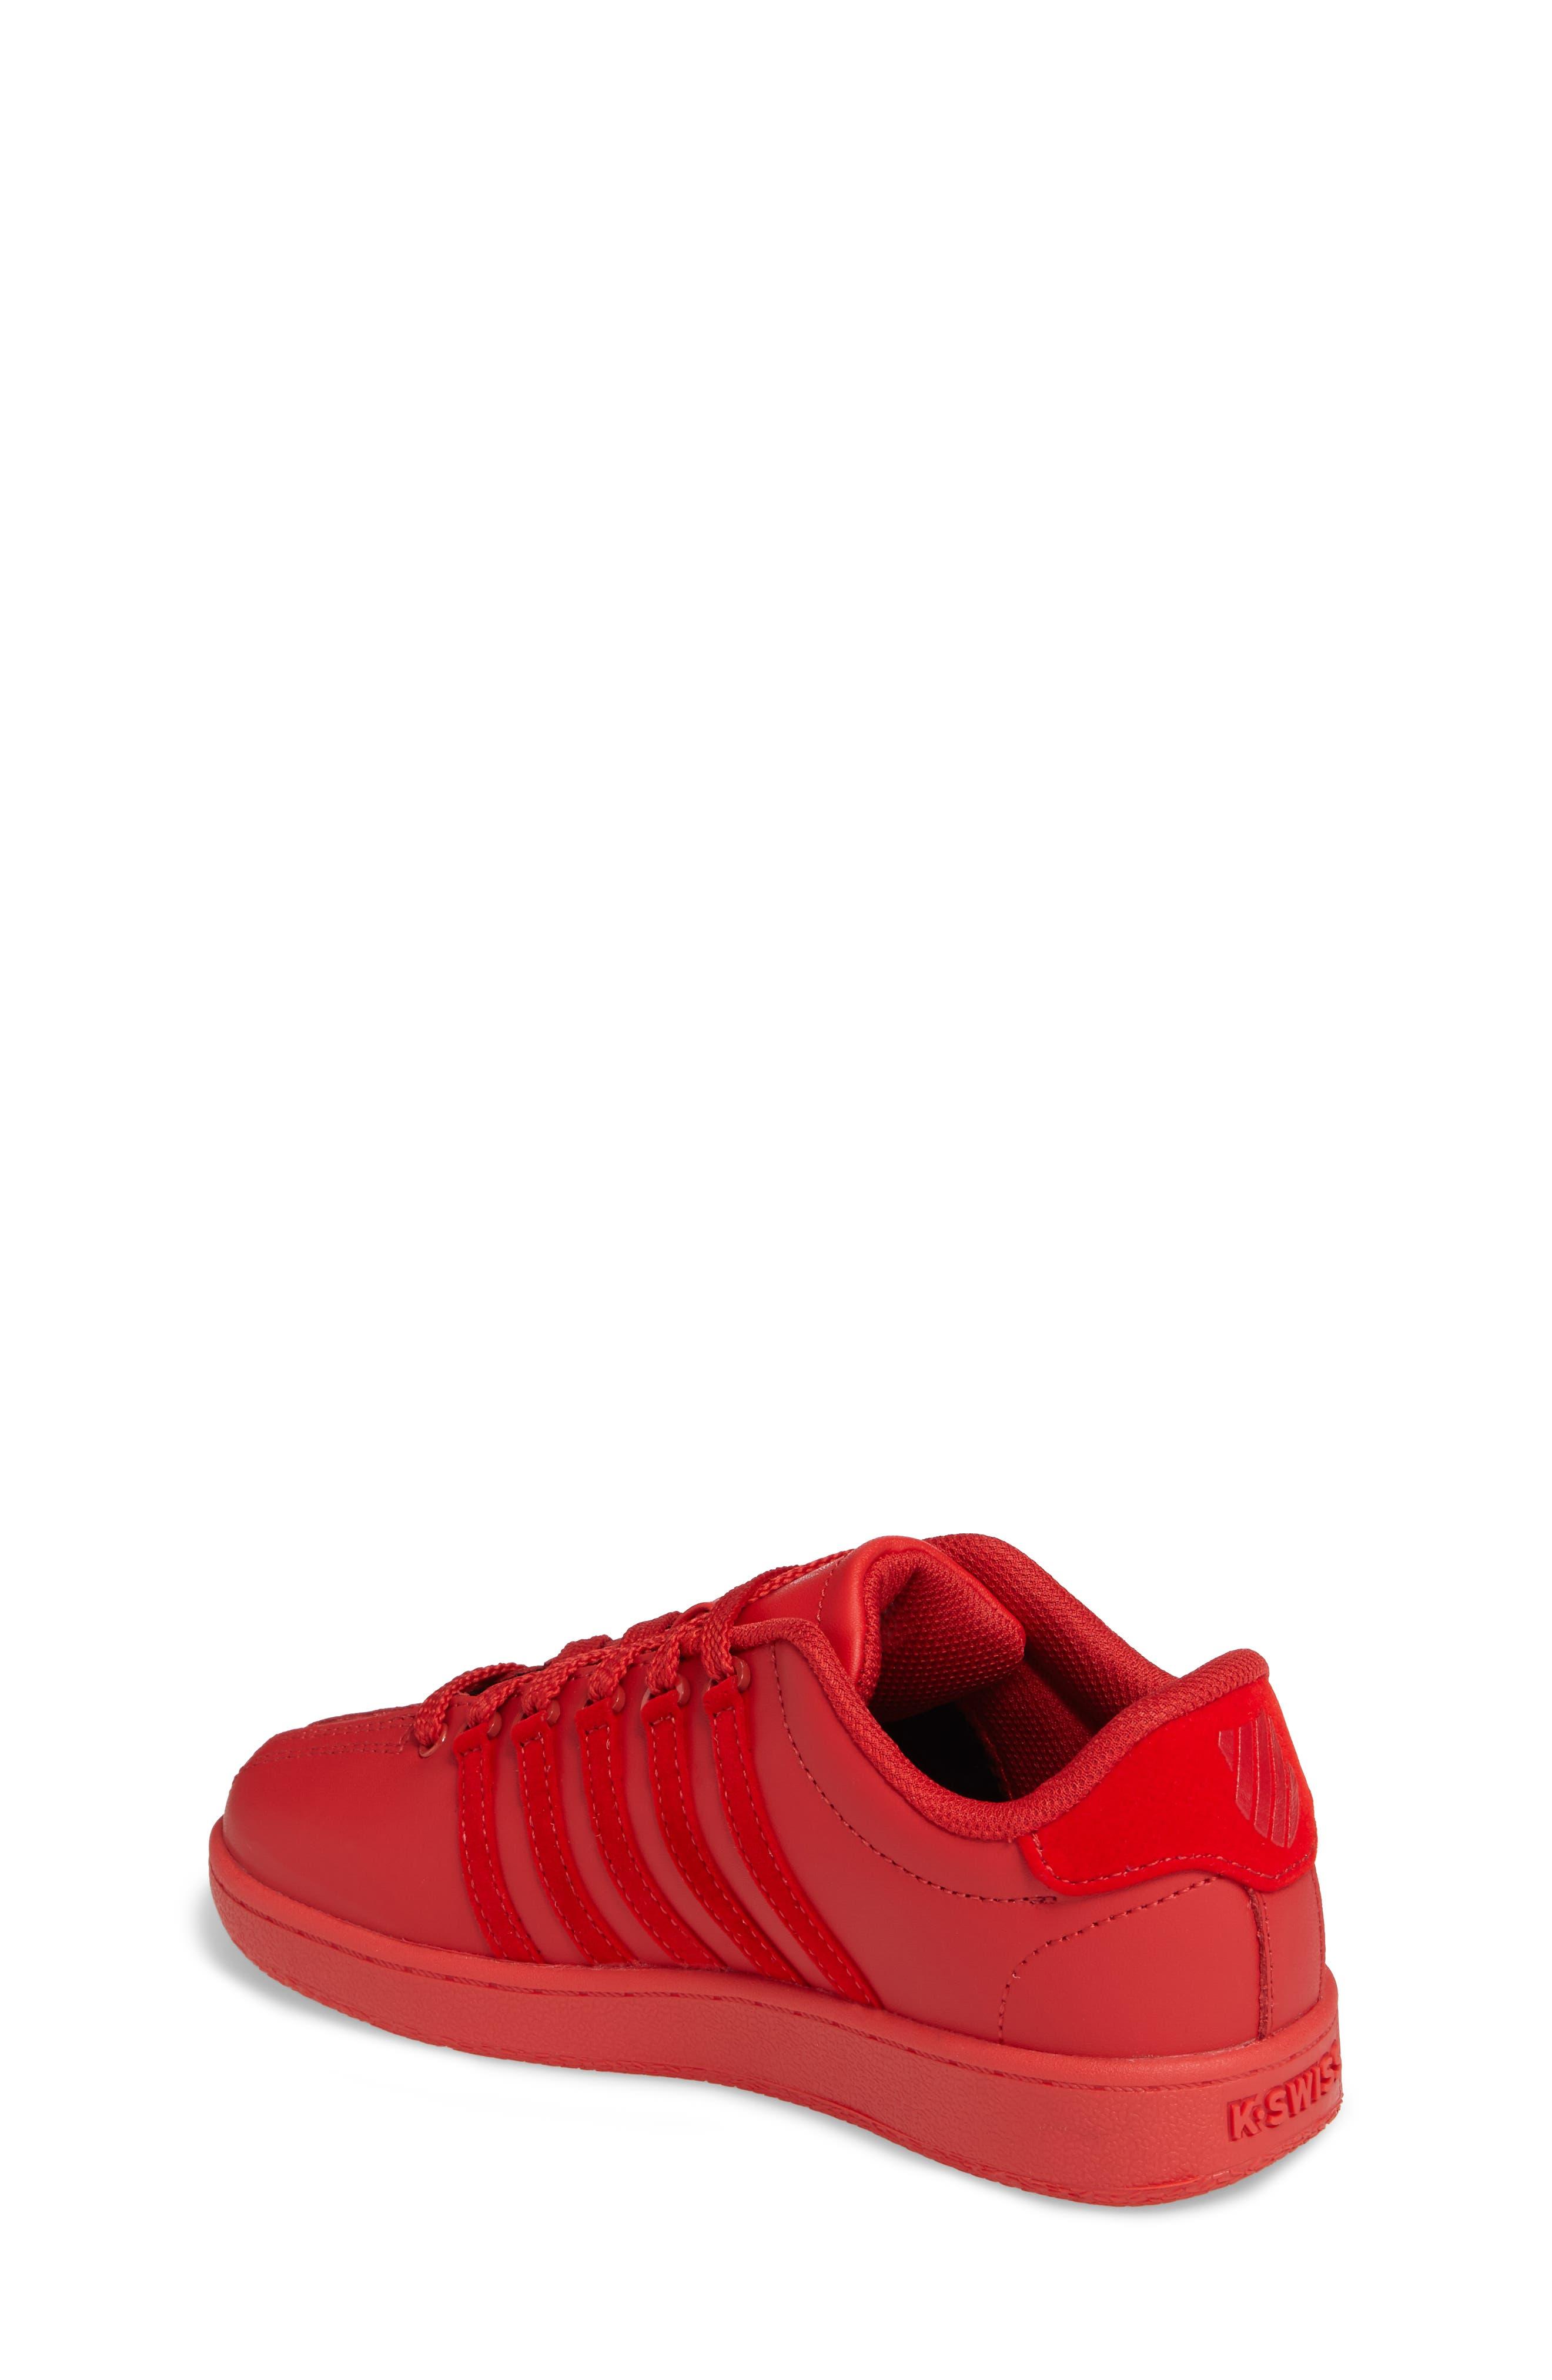 Classic VN Sneaker,                             Alternate thumbnail 2, color,                             Ribbon Red